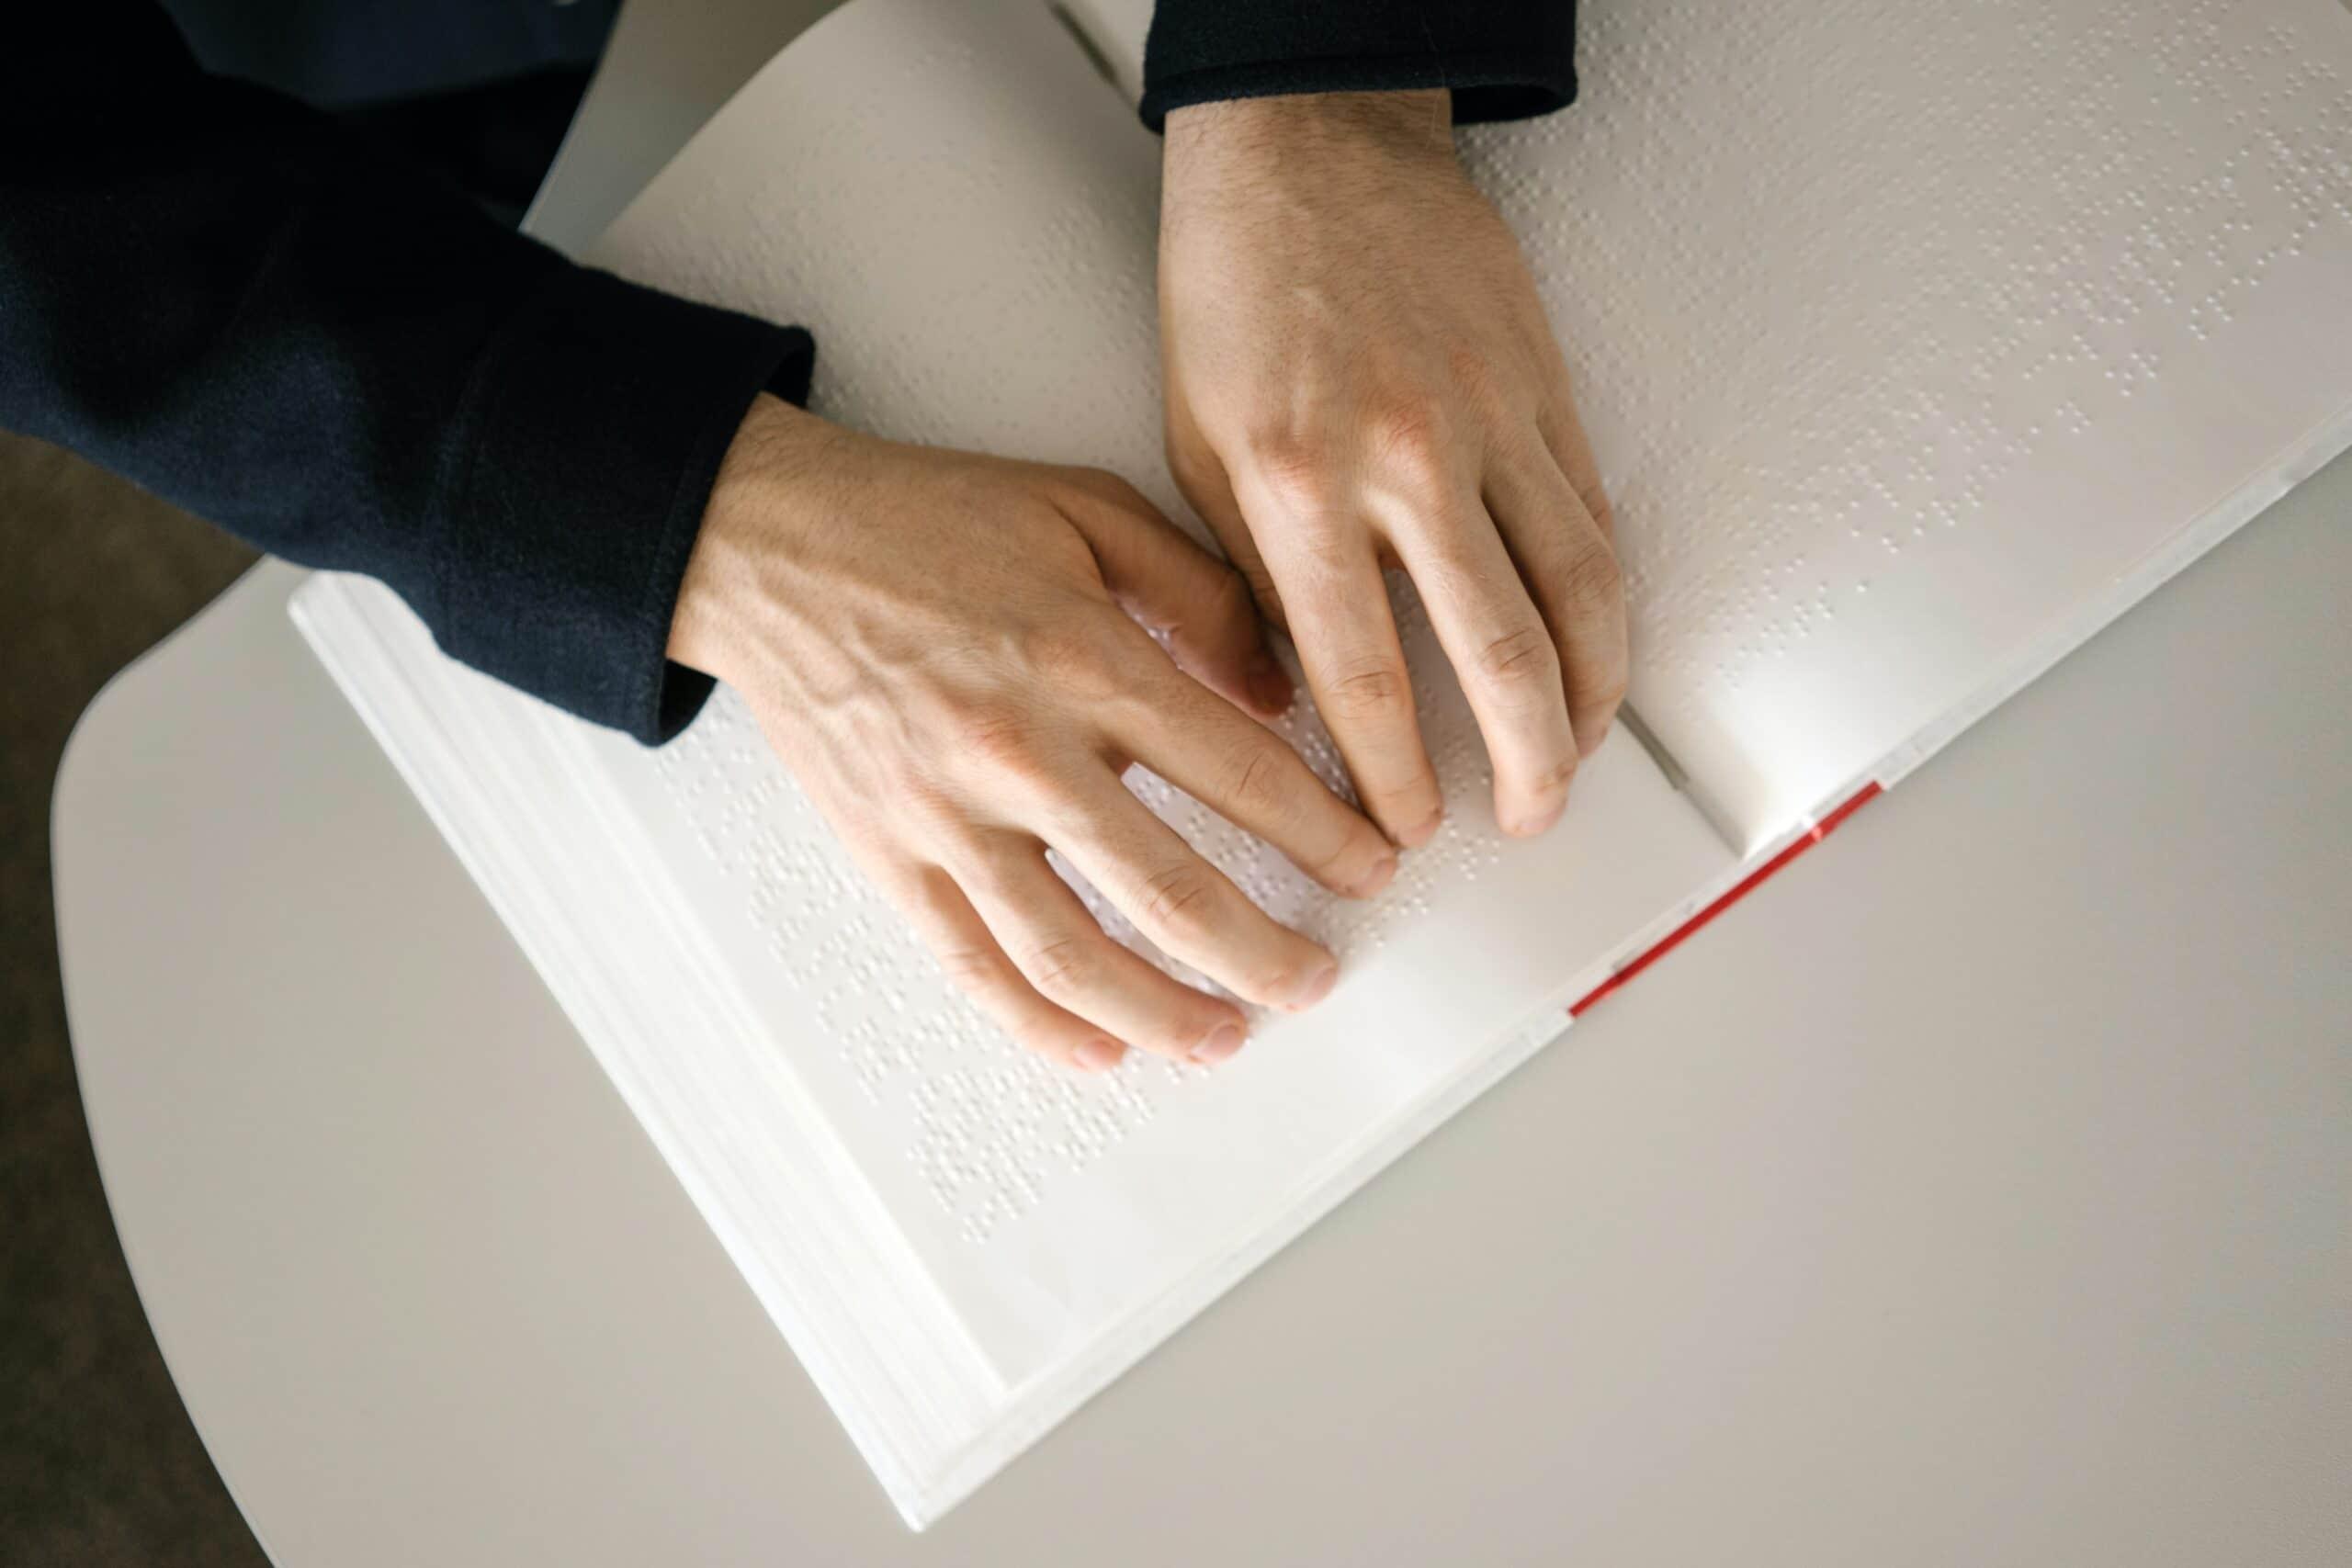 Hands on Braille book